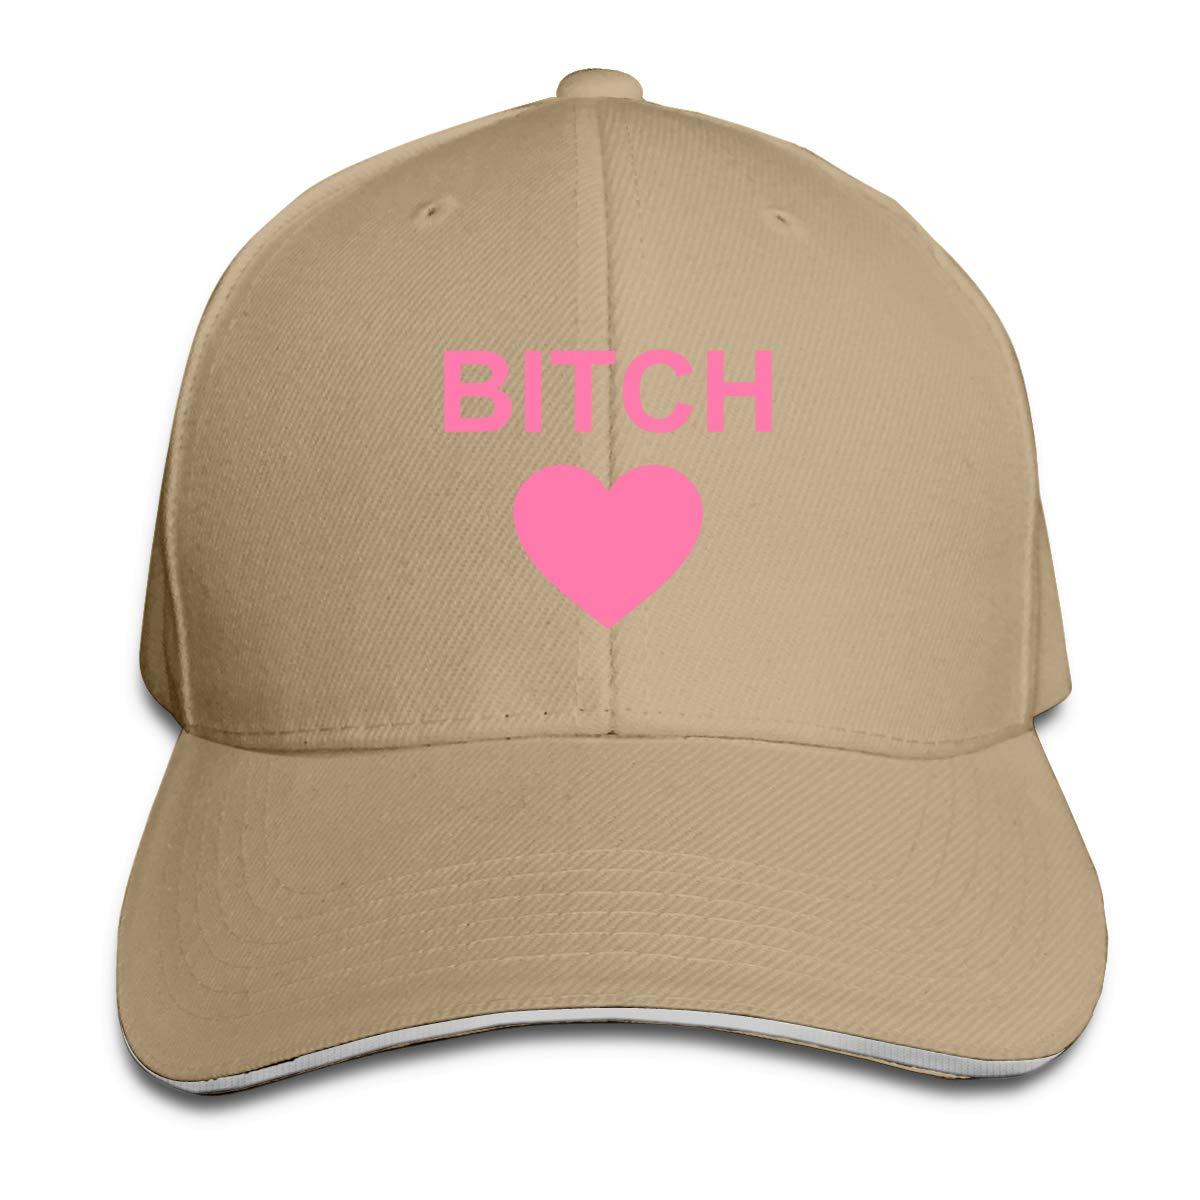 WFIRE Adult Baseball Caps Bitch Heart Custom Adjustable Sandwich Cap Casquette Hats